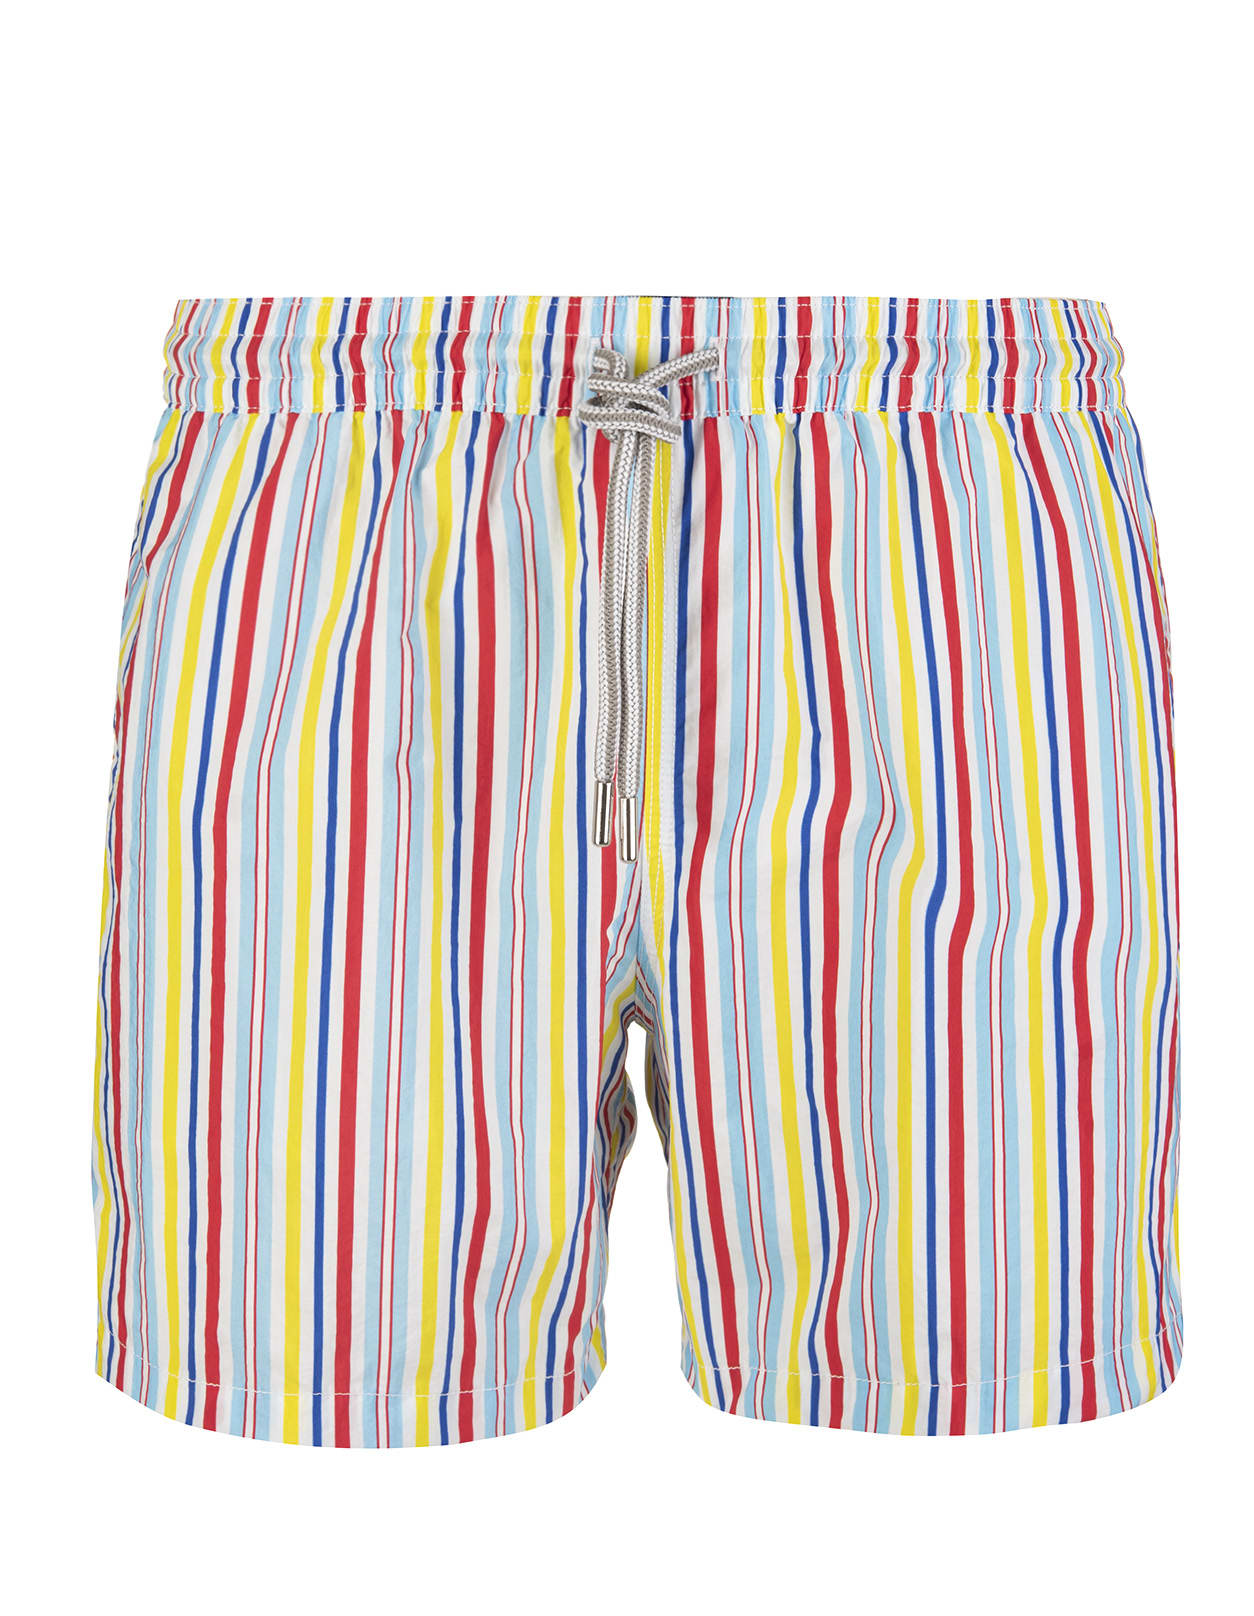 Multicolor Striped Swimsuit